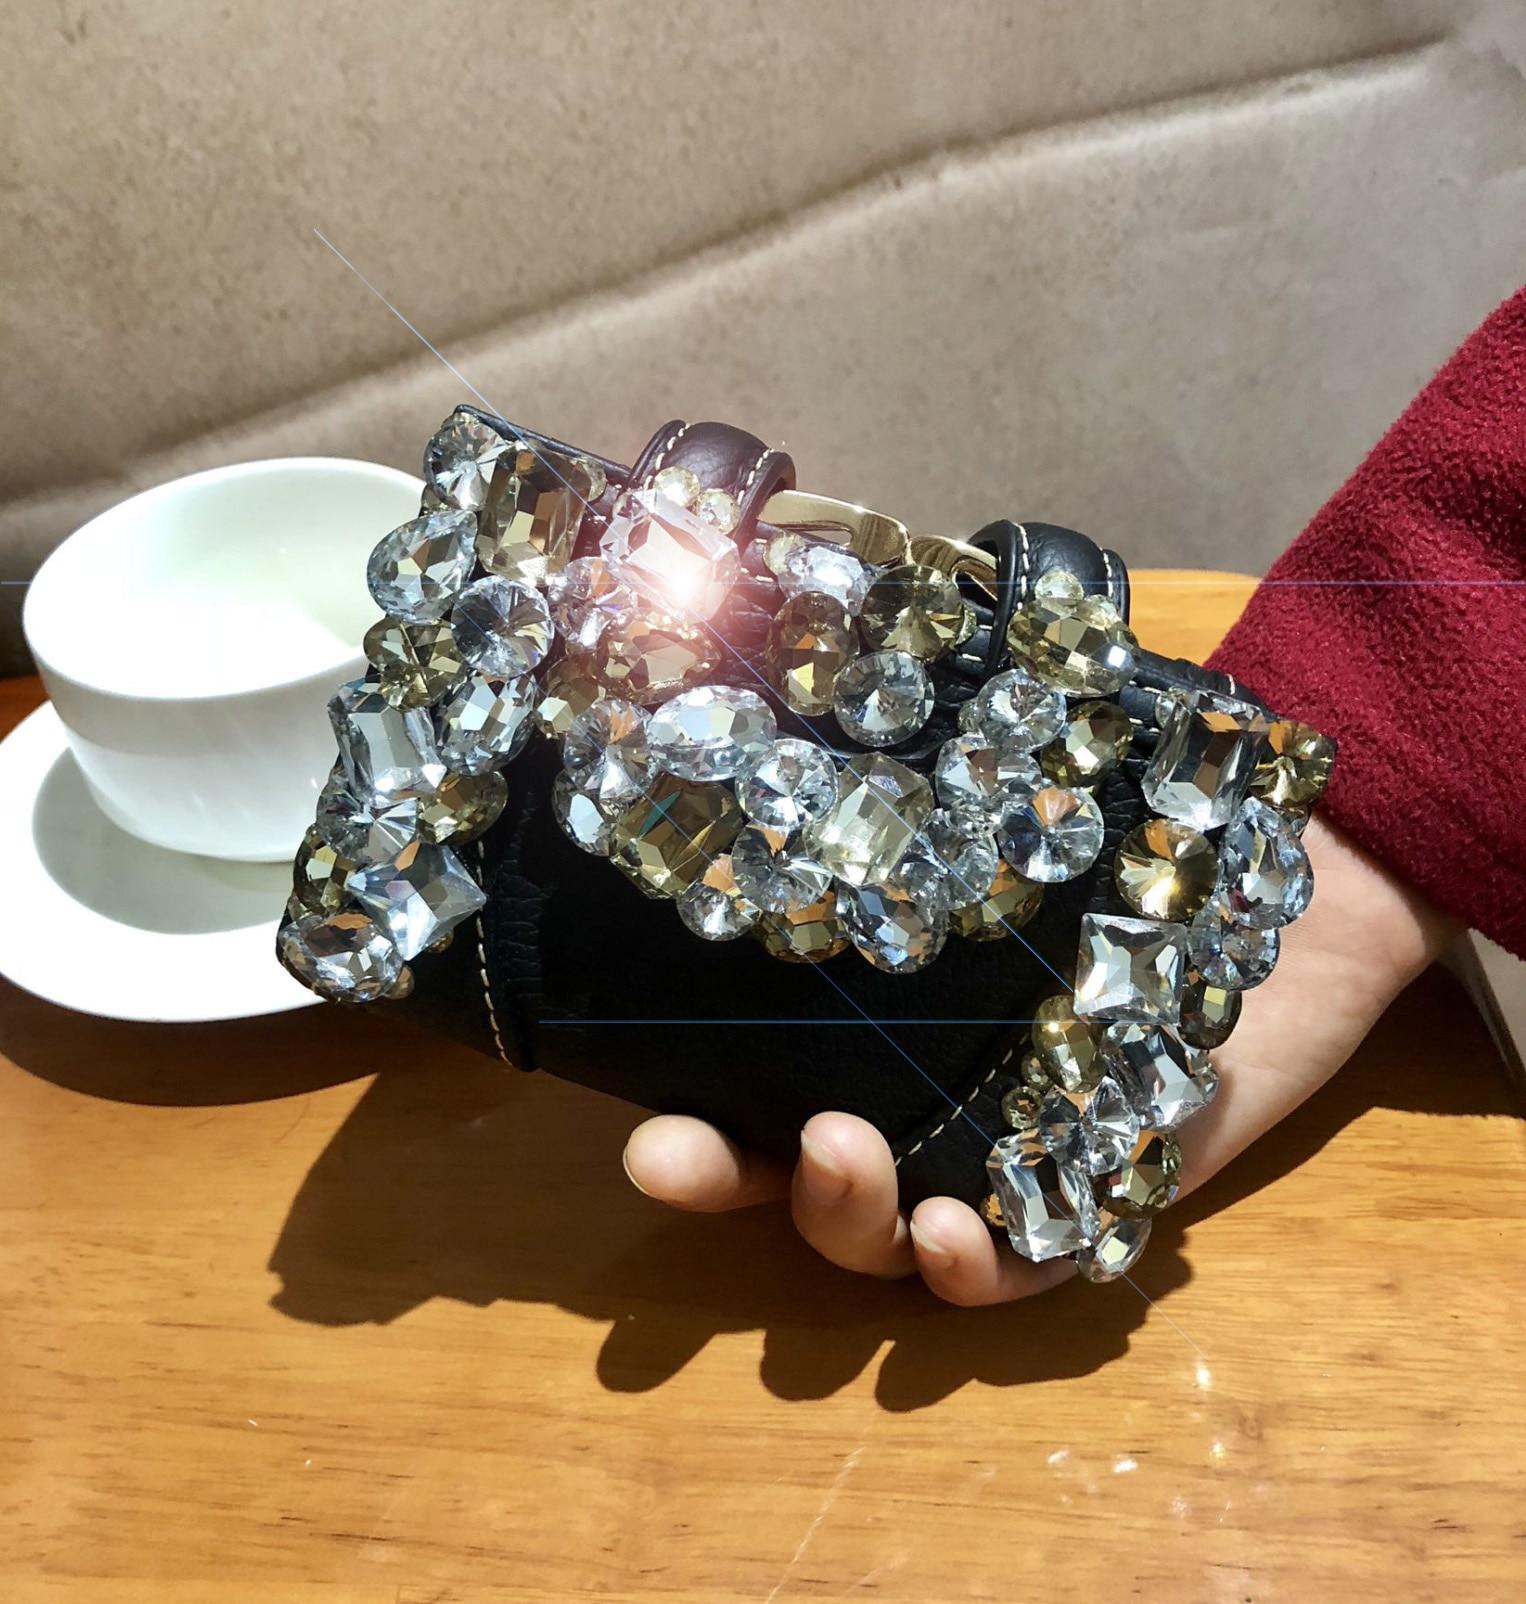 New Genuine Leather Women's Wallet Fashion Diamond Female Snap Button Folding Rhinestone Short Wallet Coin Purse Cowhide Wallets